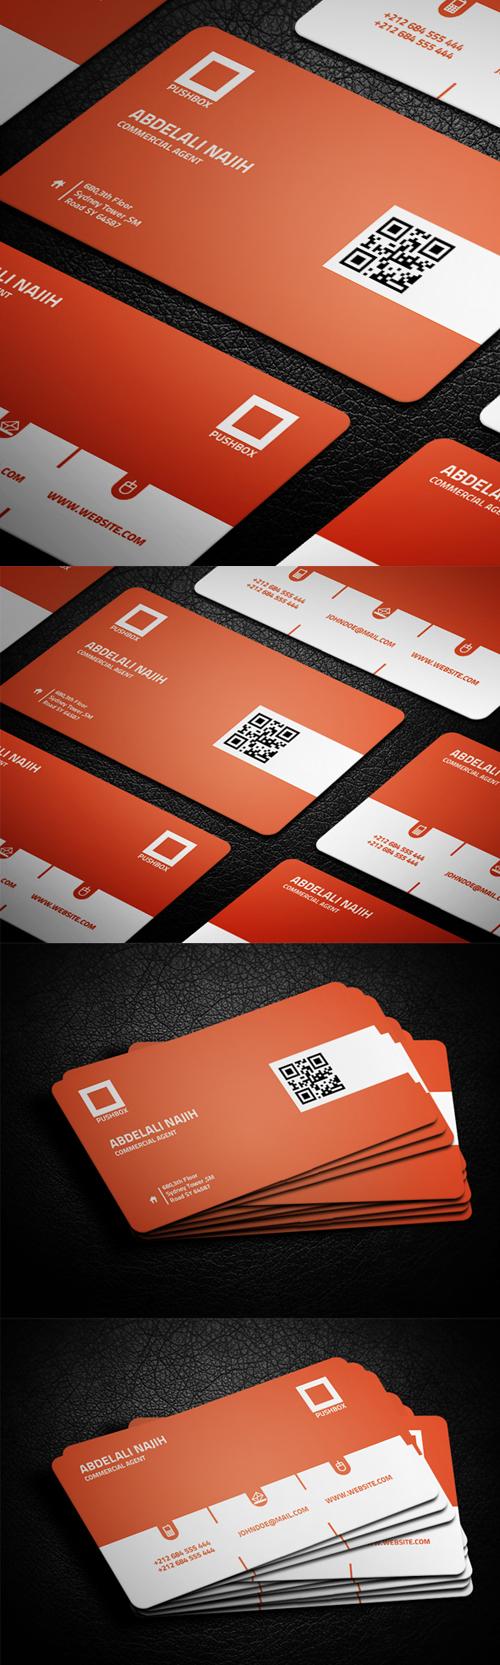 business cards template design - 10